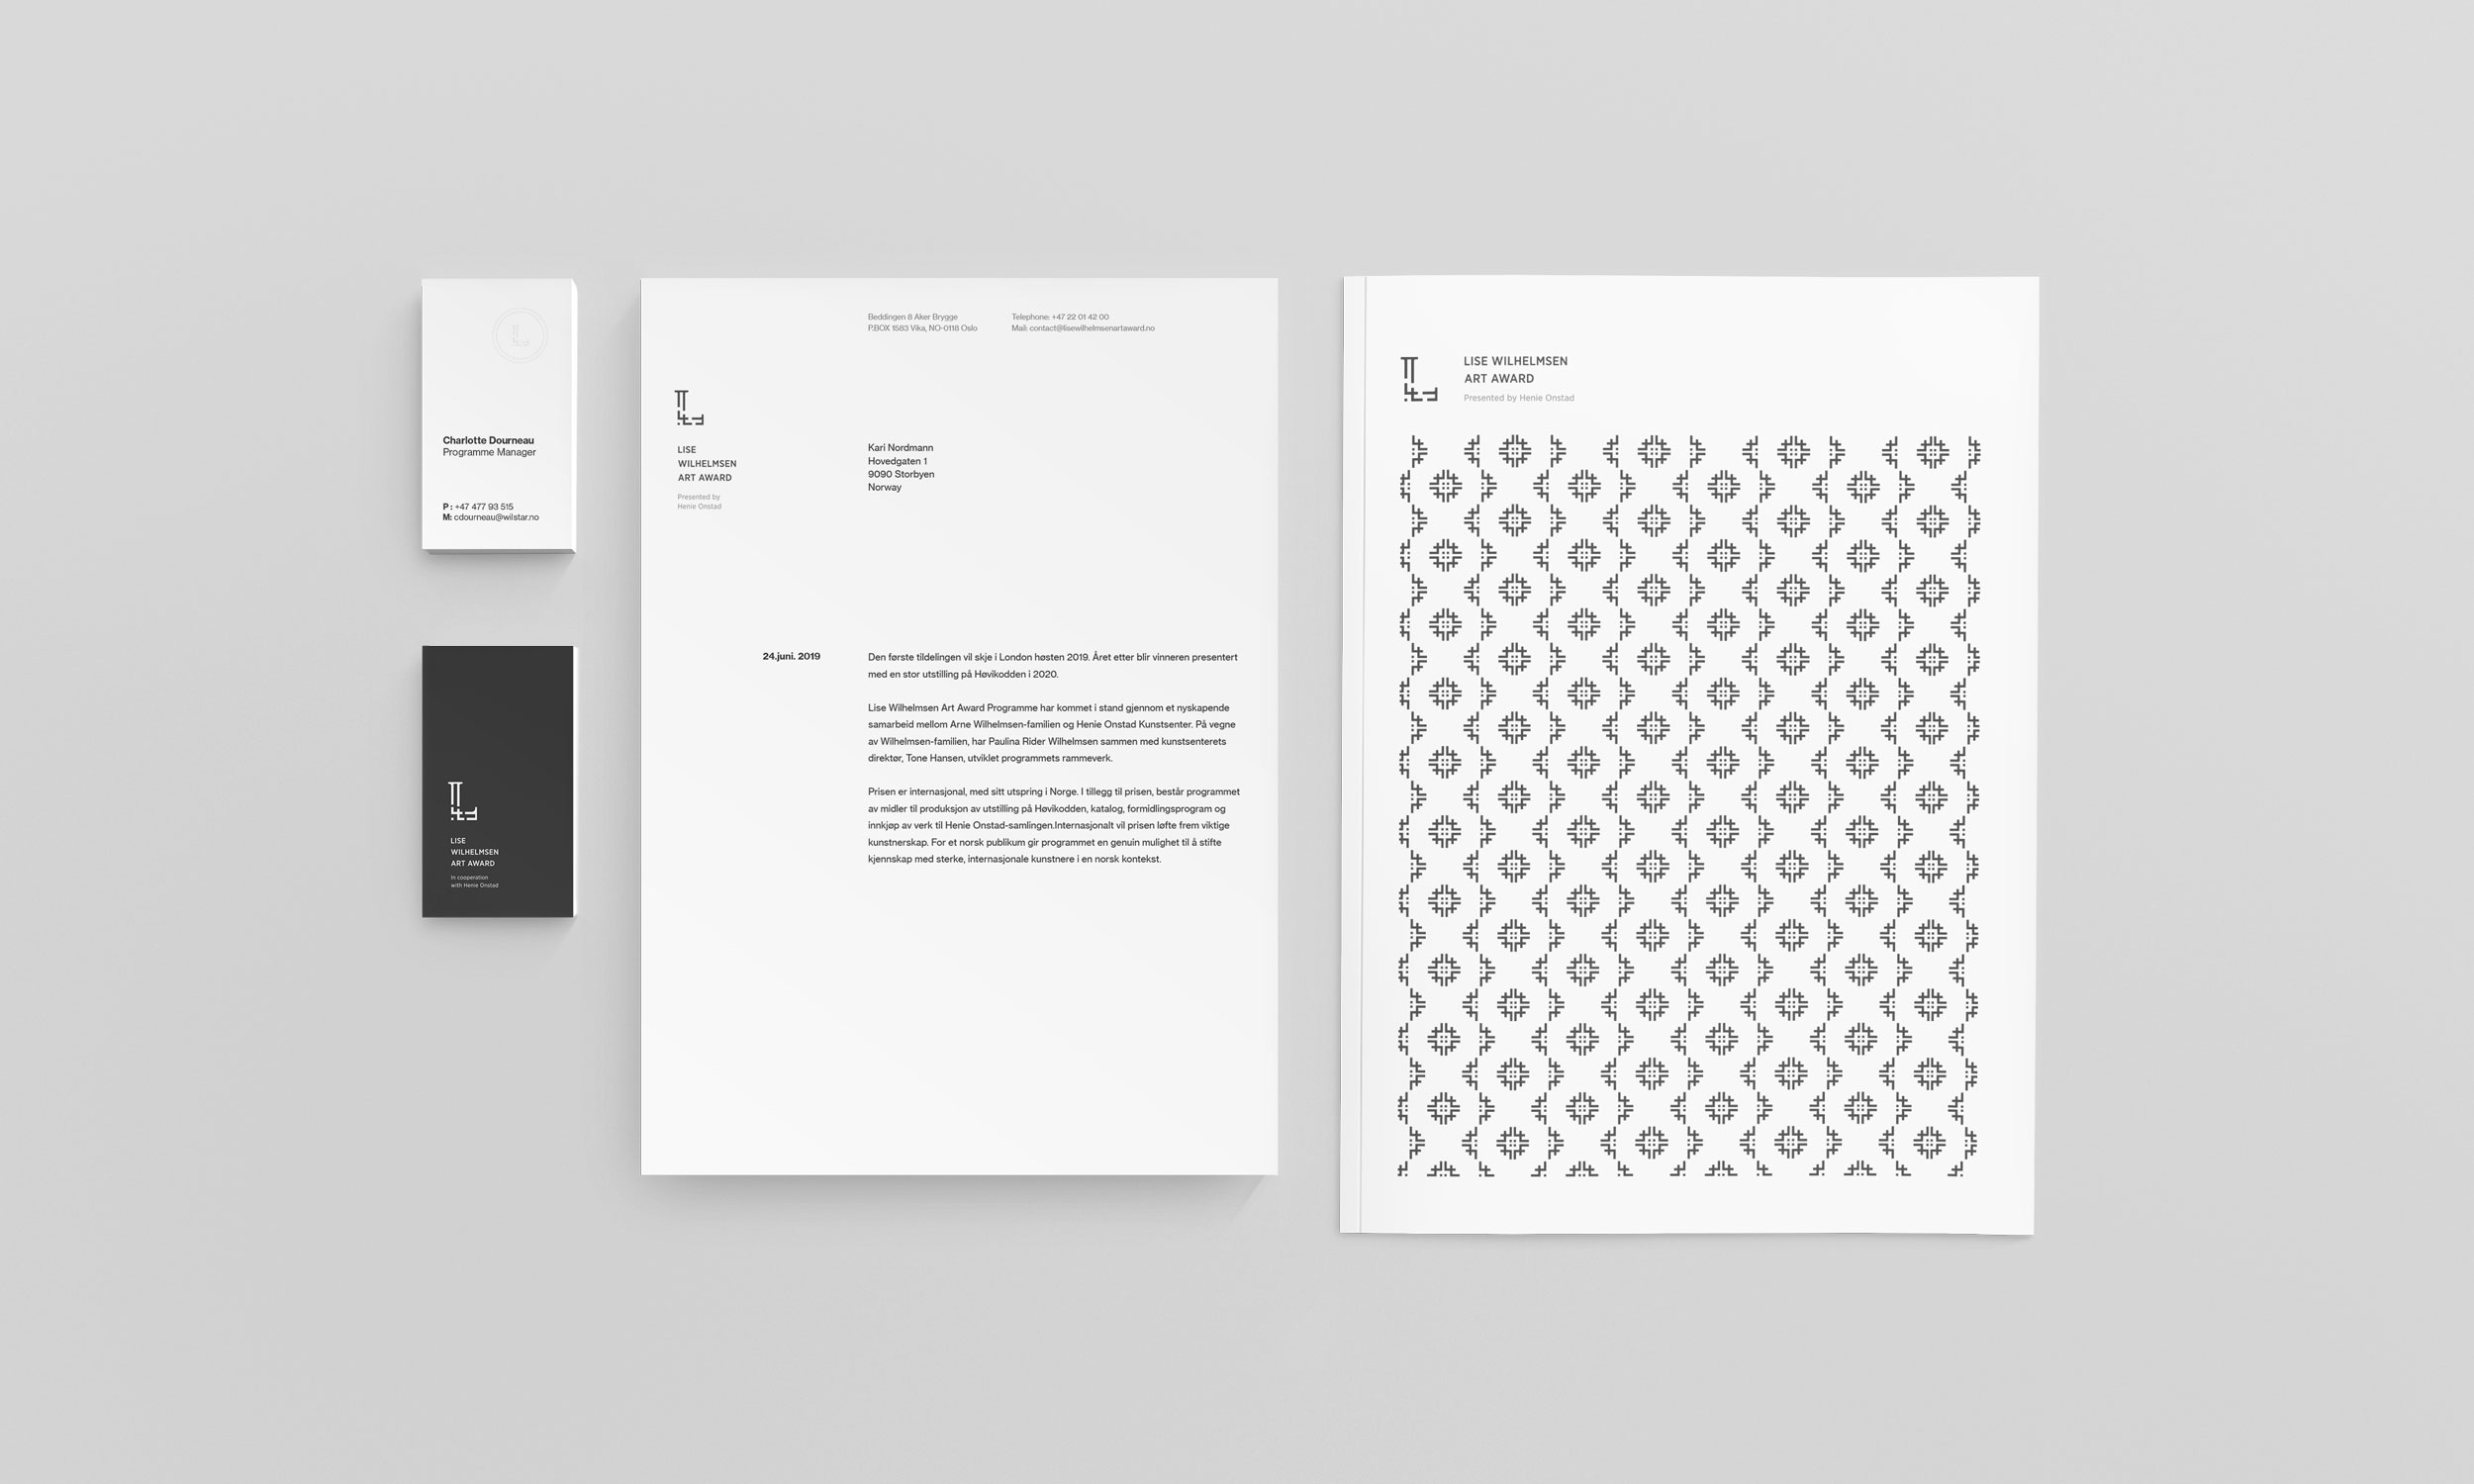 Lise Wilhelmsen Art Award visual identity, design by SBDS